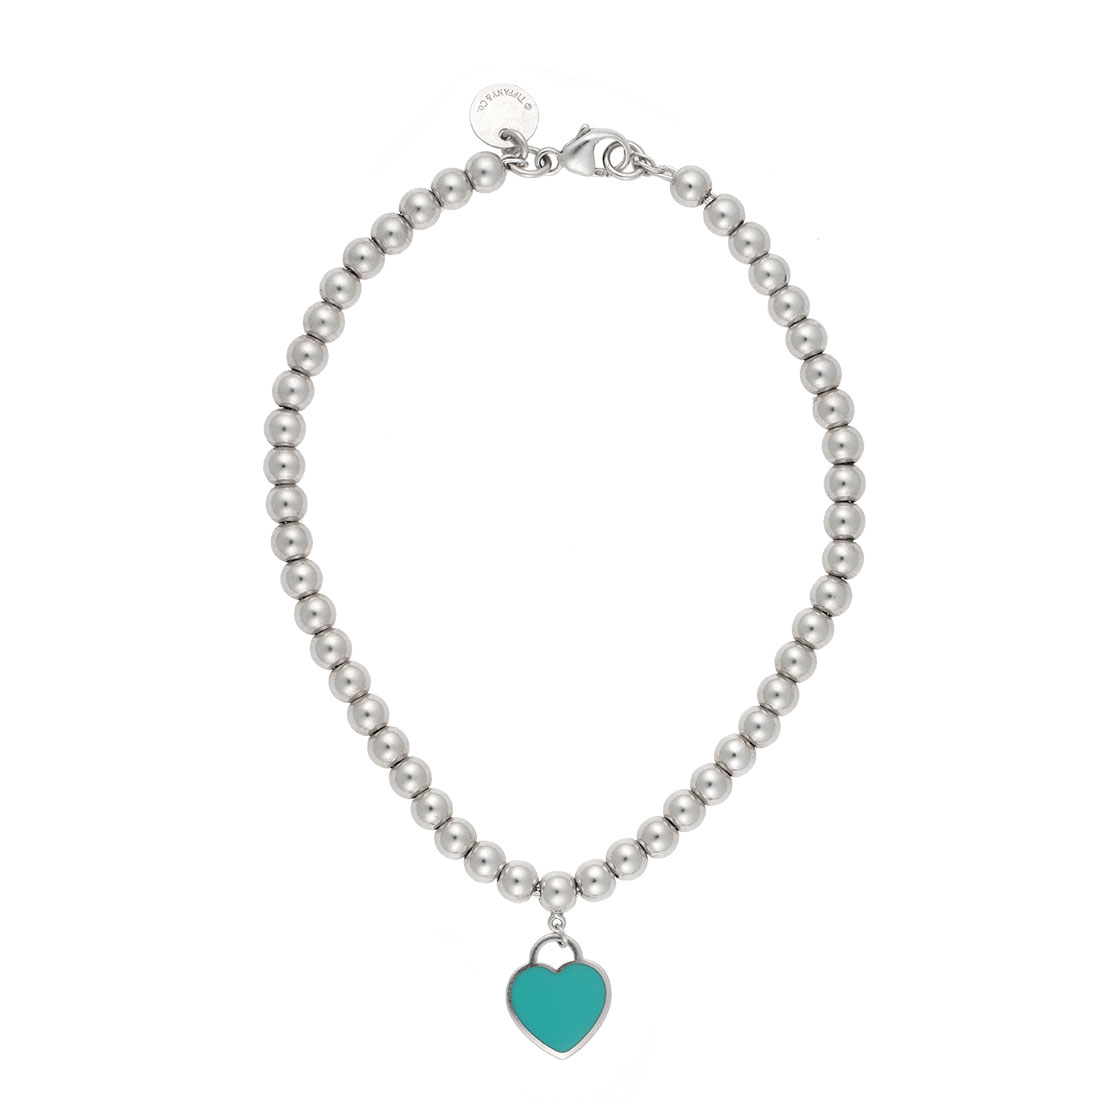 b344c25f0 Tiffany & Co. Return To Tiffany Bead Bracelet | Tiffany & Co. | Buy ...